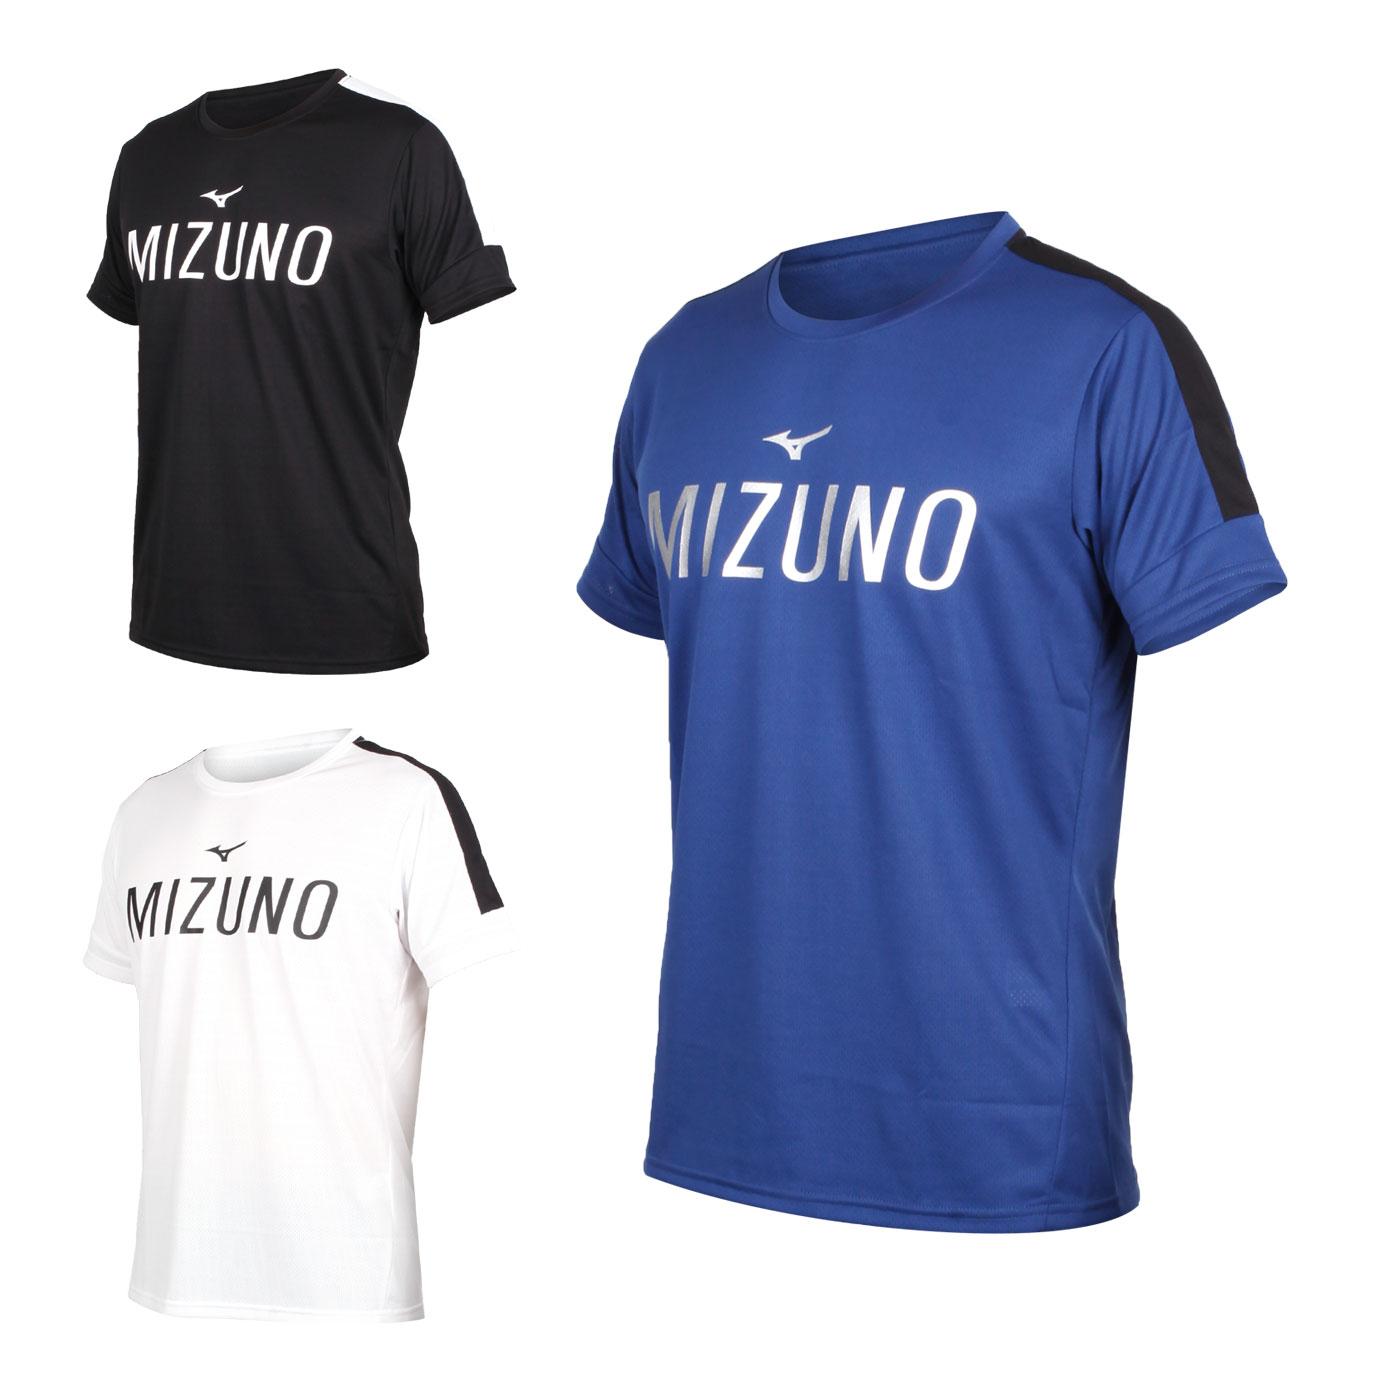 MIZUNO 男款短袖T恤 K2TA050201